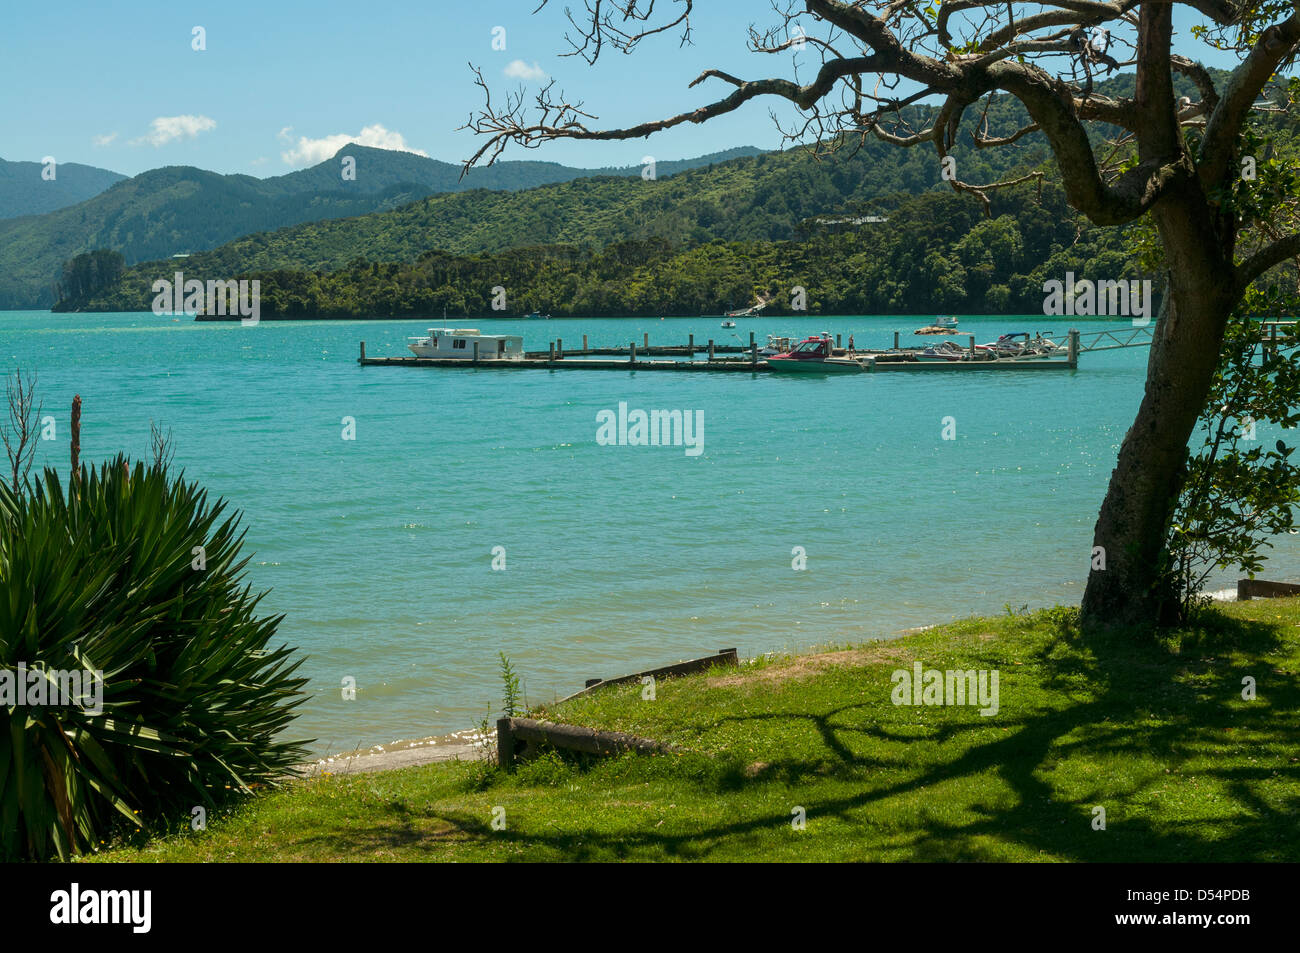 Portage Bay from Portage, Marlborough, New Zealand - Stock Image